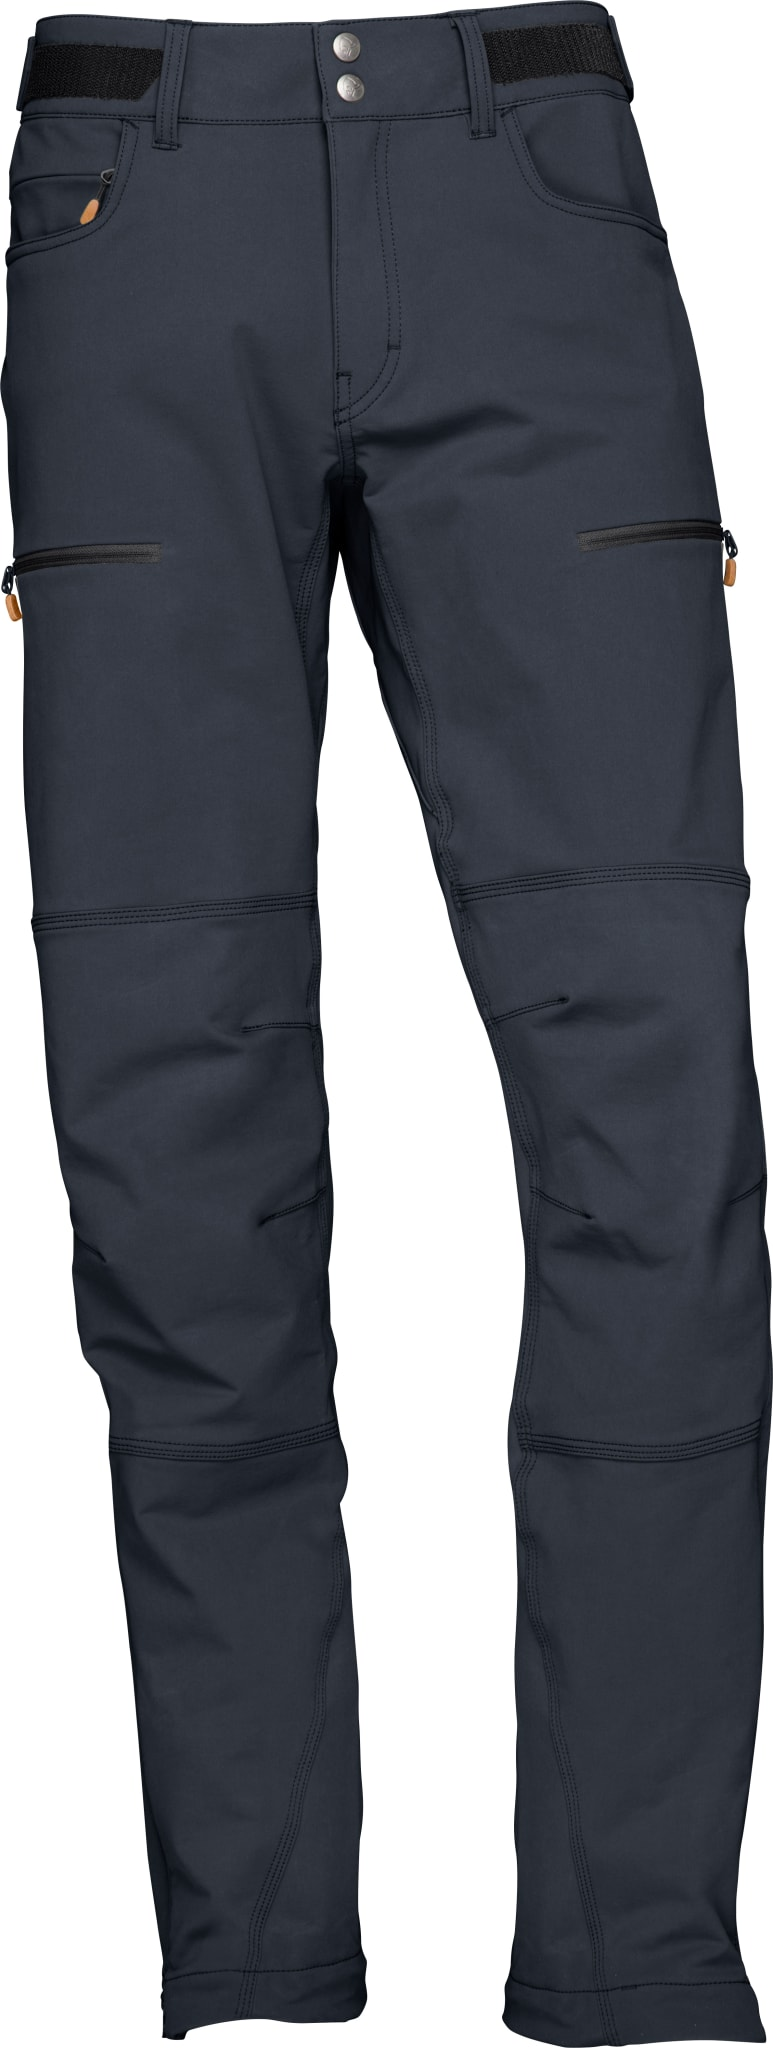 186b57f4 Allsidige, middels tykke soft shell-bukser til et variert friluftsliv.  Norrøna. Svalbard Flex1 Pants M